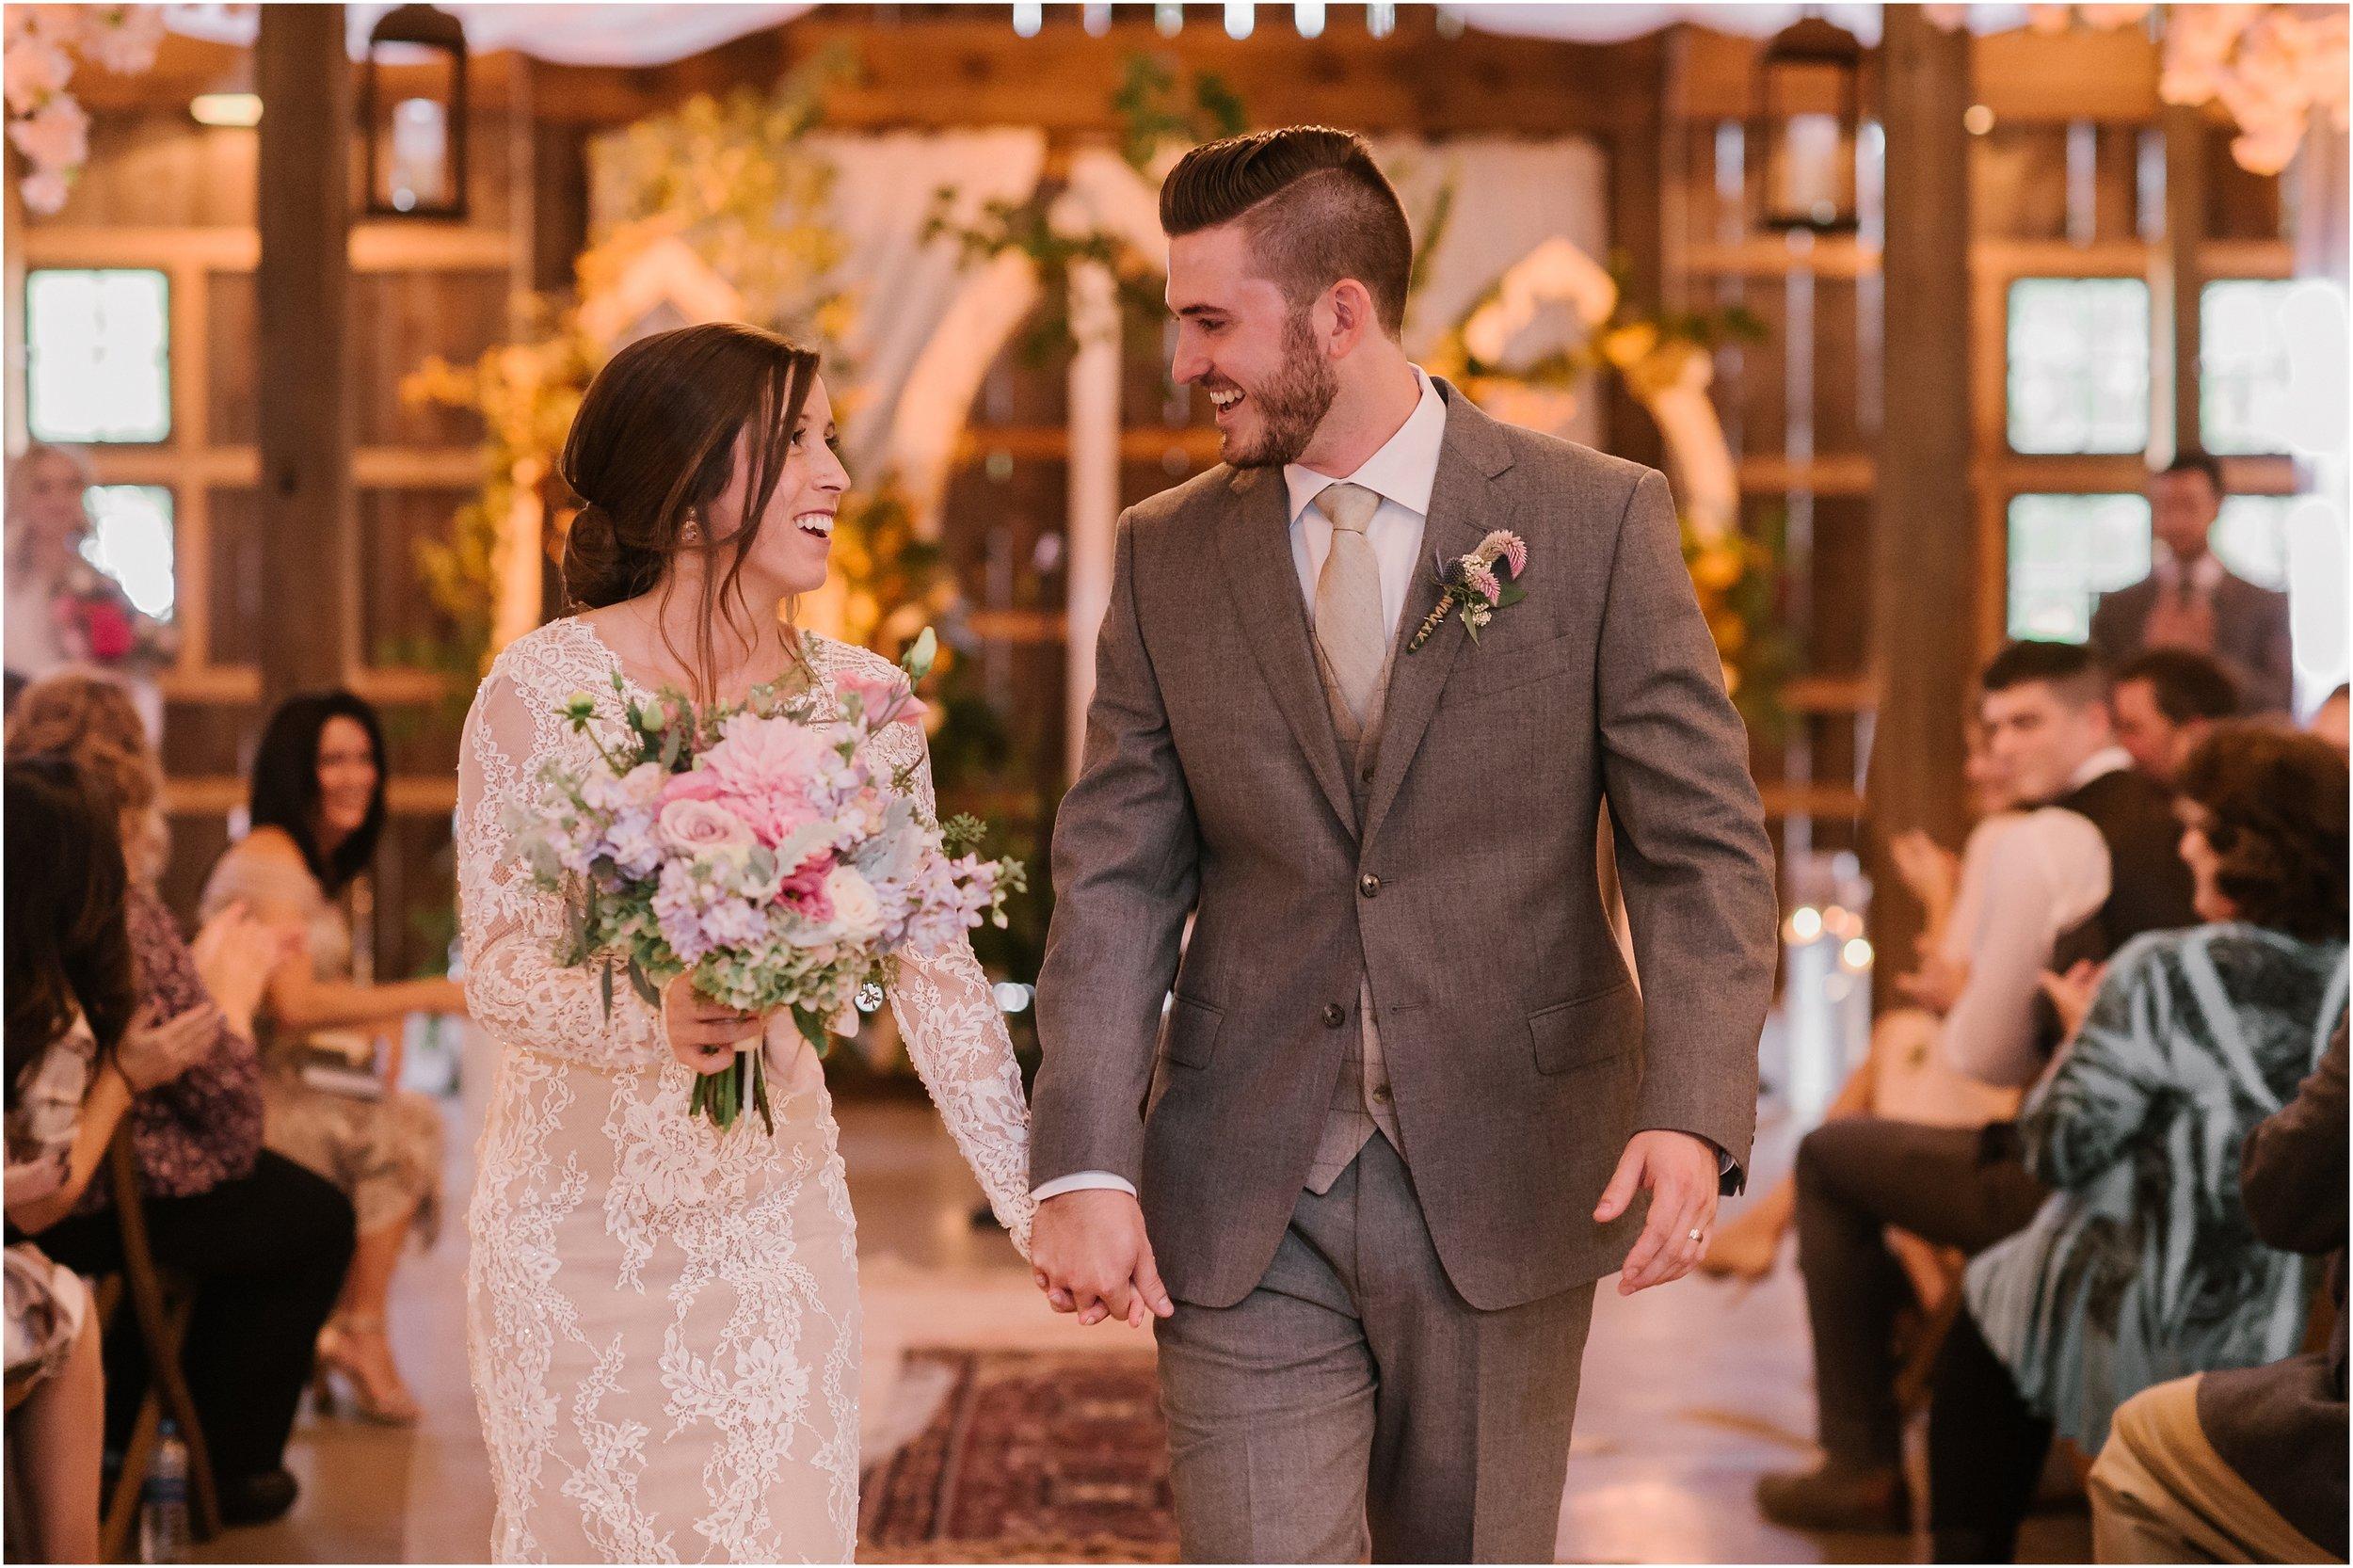 Rebecca_Shehorn_Photography_Indianapolis_Wedding_Photographer_9272.jpg